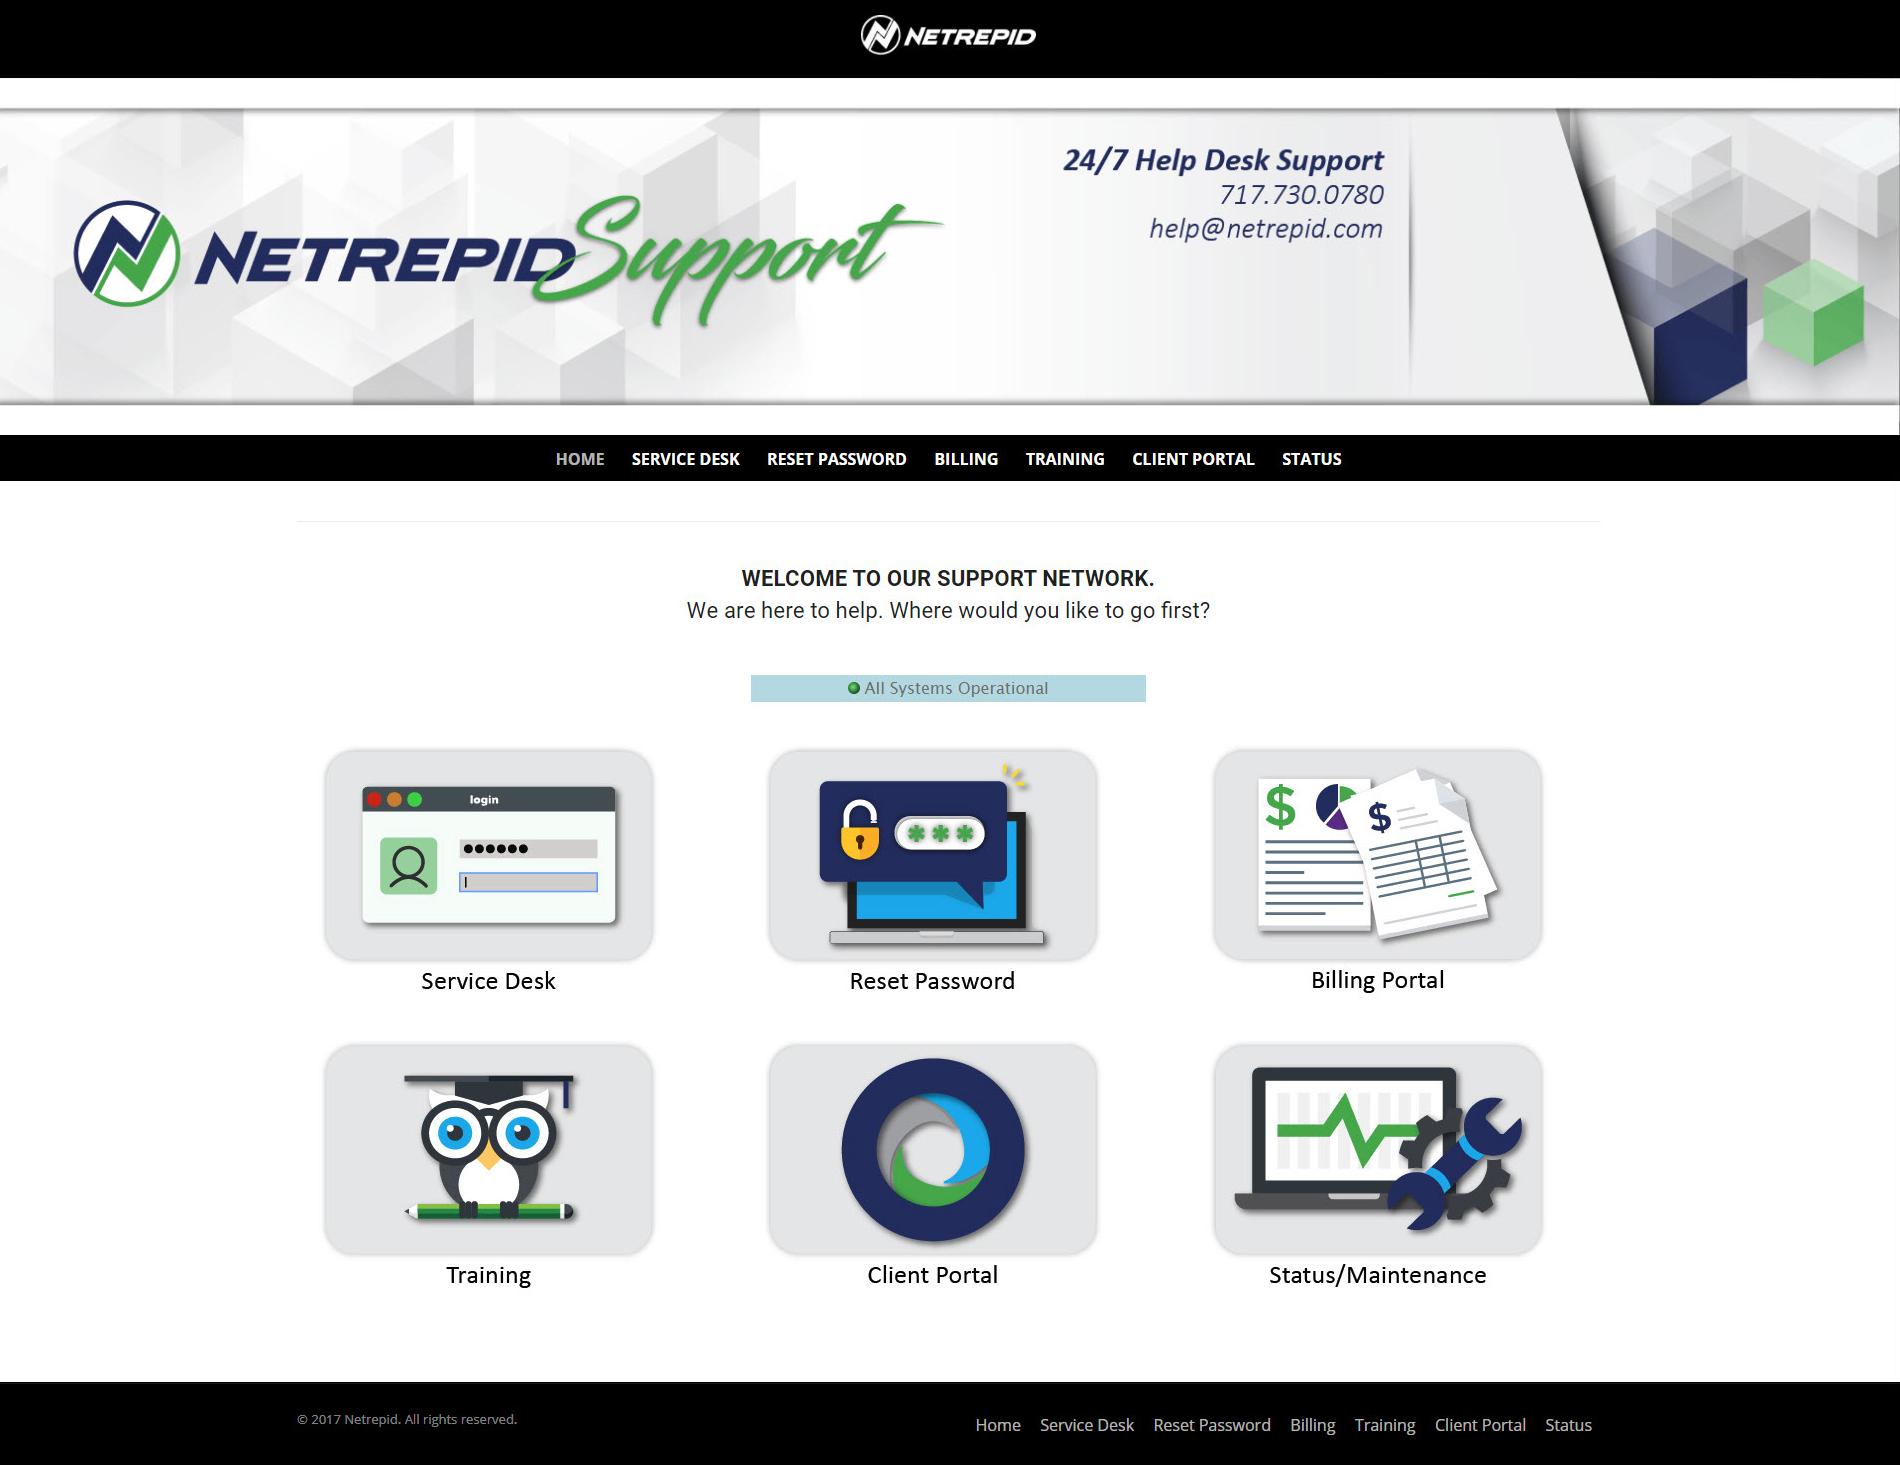 Netrepid Demo - Netrepid Client Support Portal